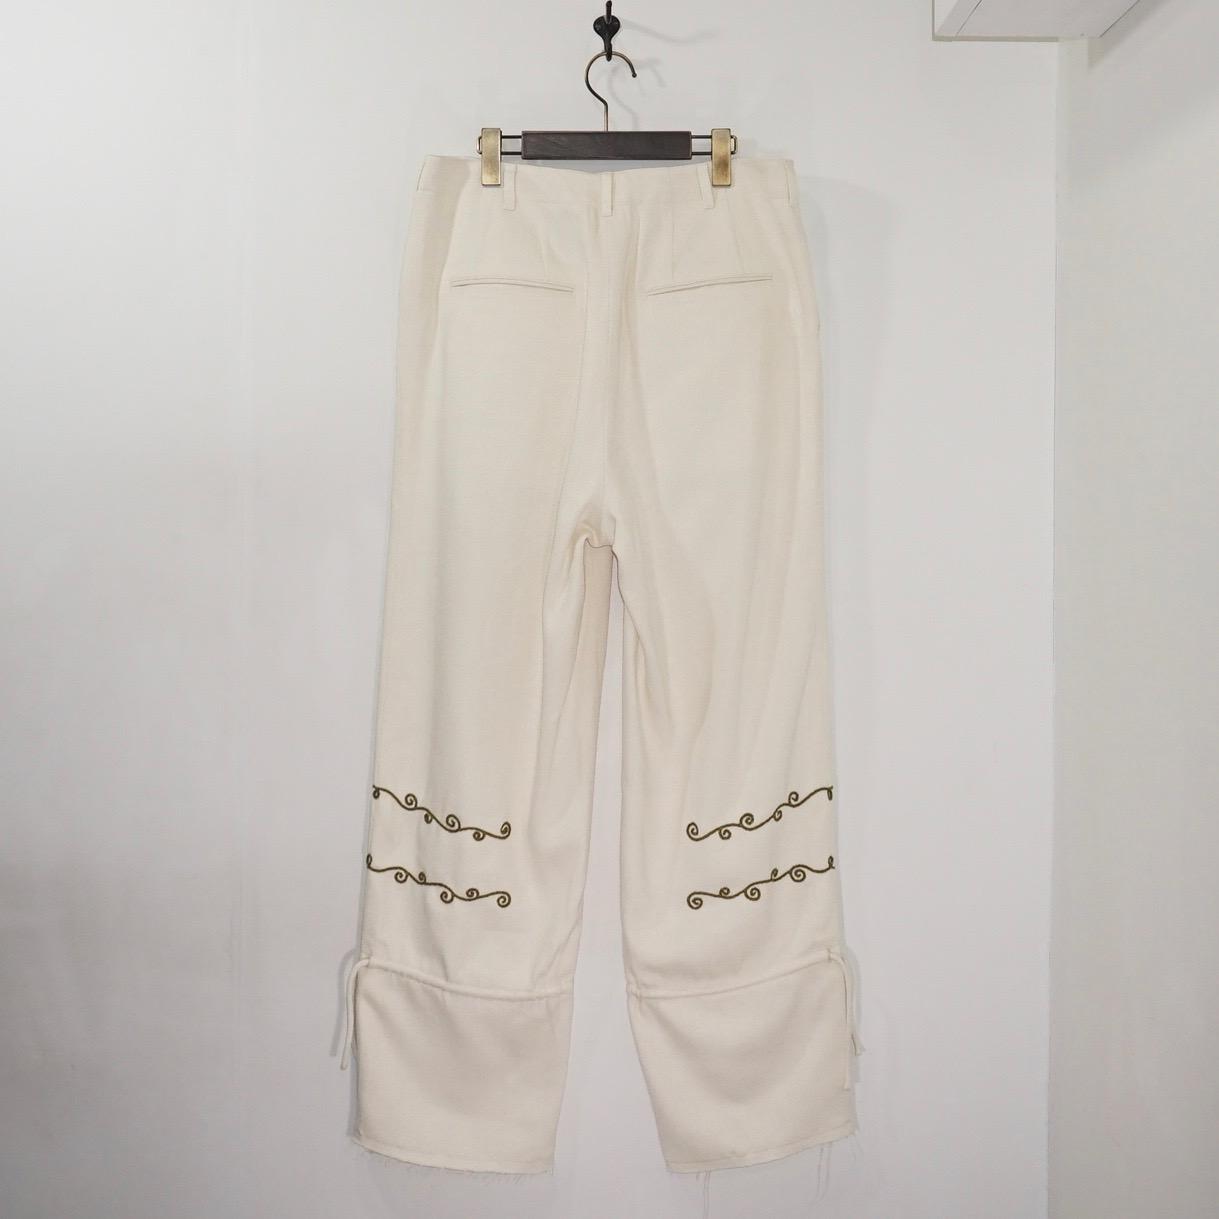 NANUA (ナヌーア) | thai scroll pattern silk nail ankle tied pants (タイ スクロールパターン シルクノイルアンクルタイドパンツ) - green